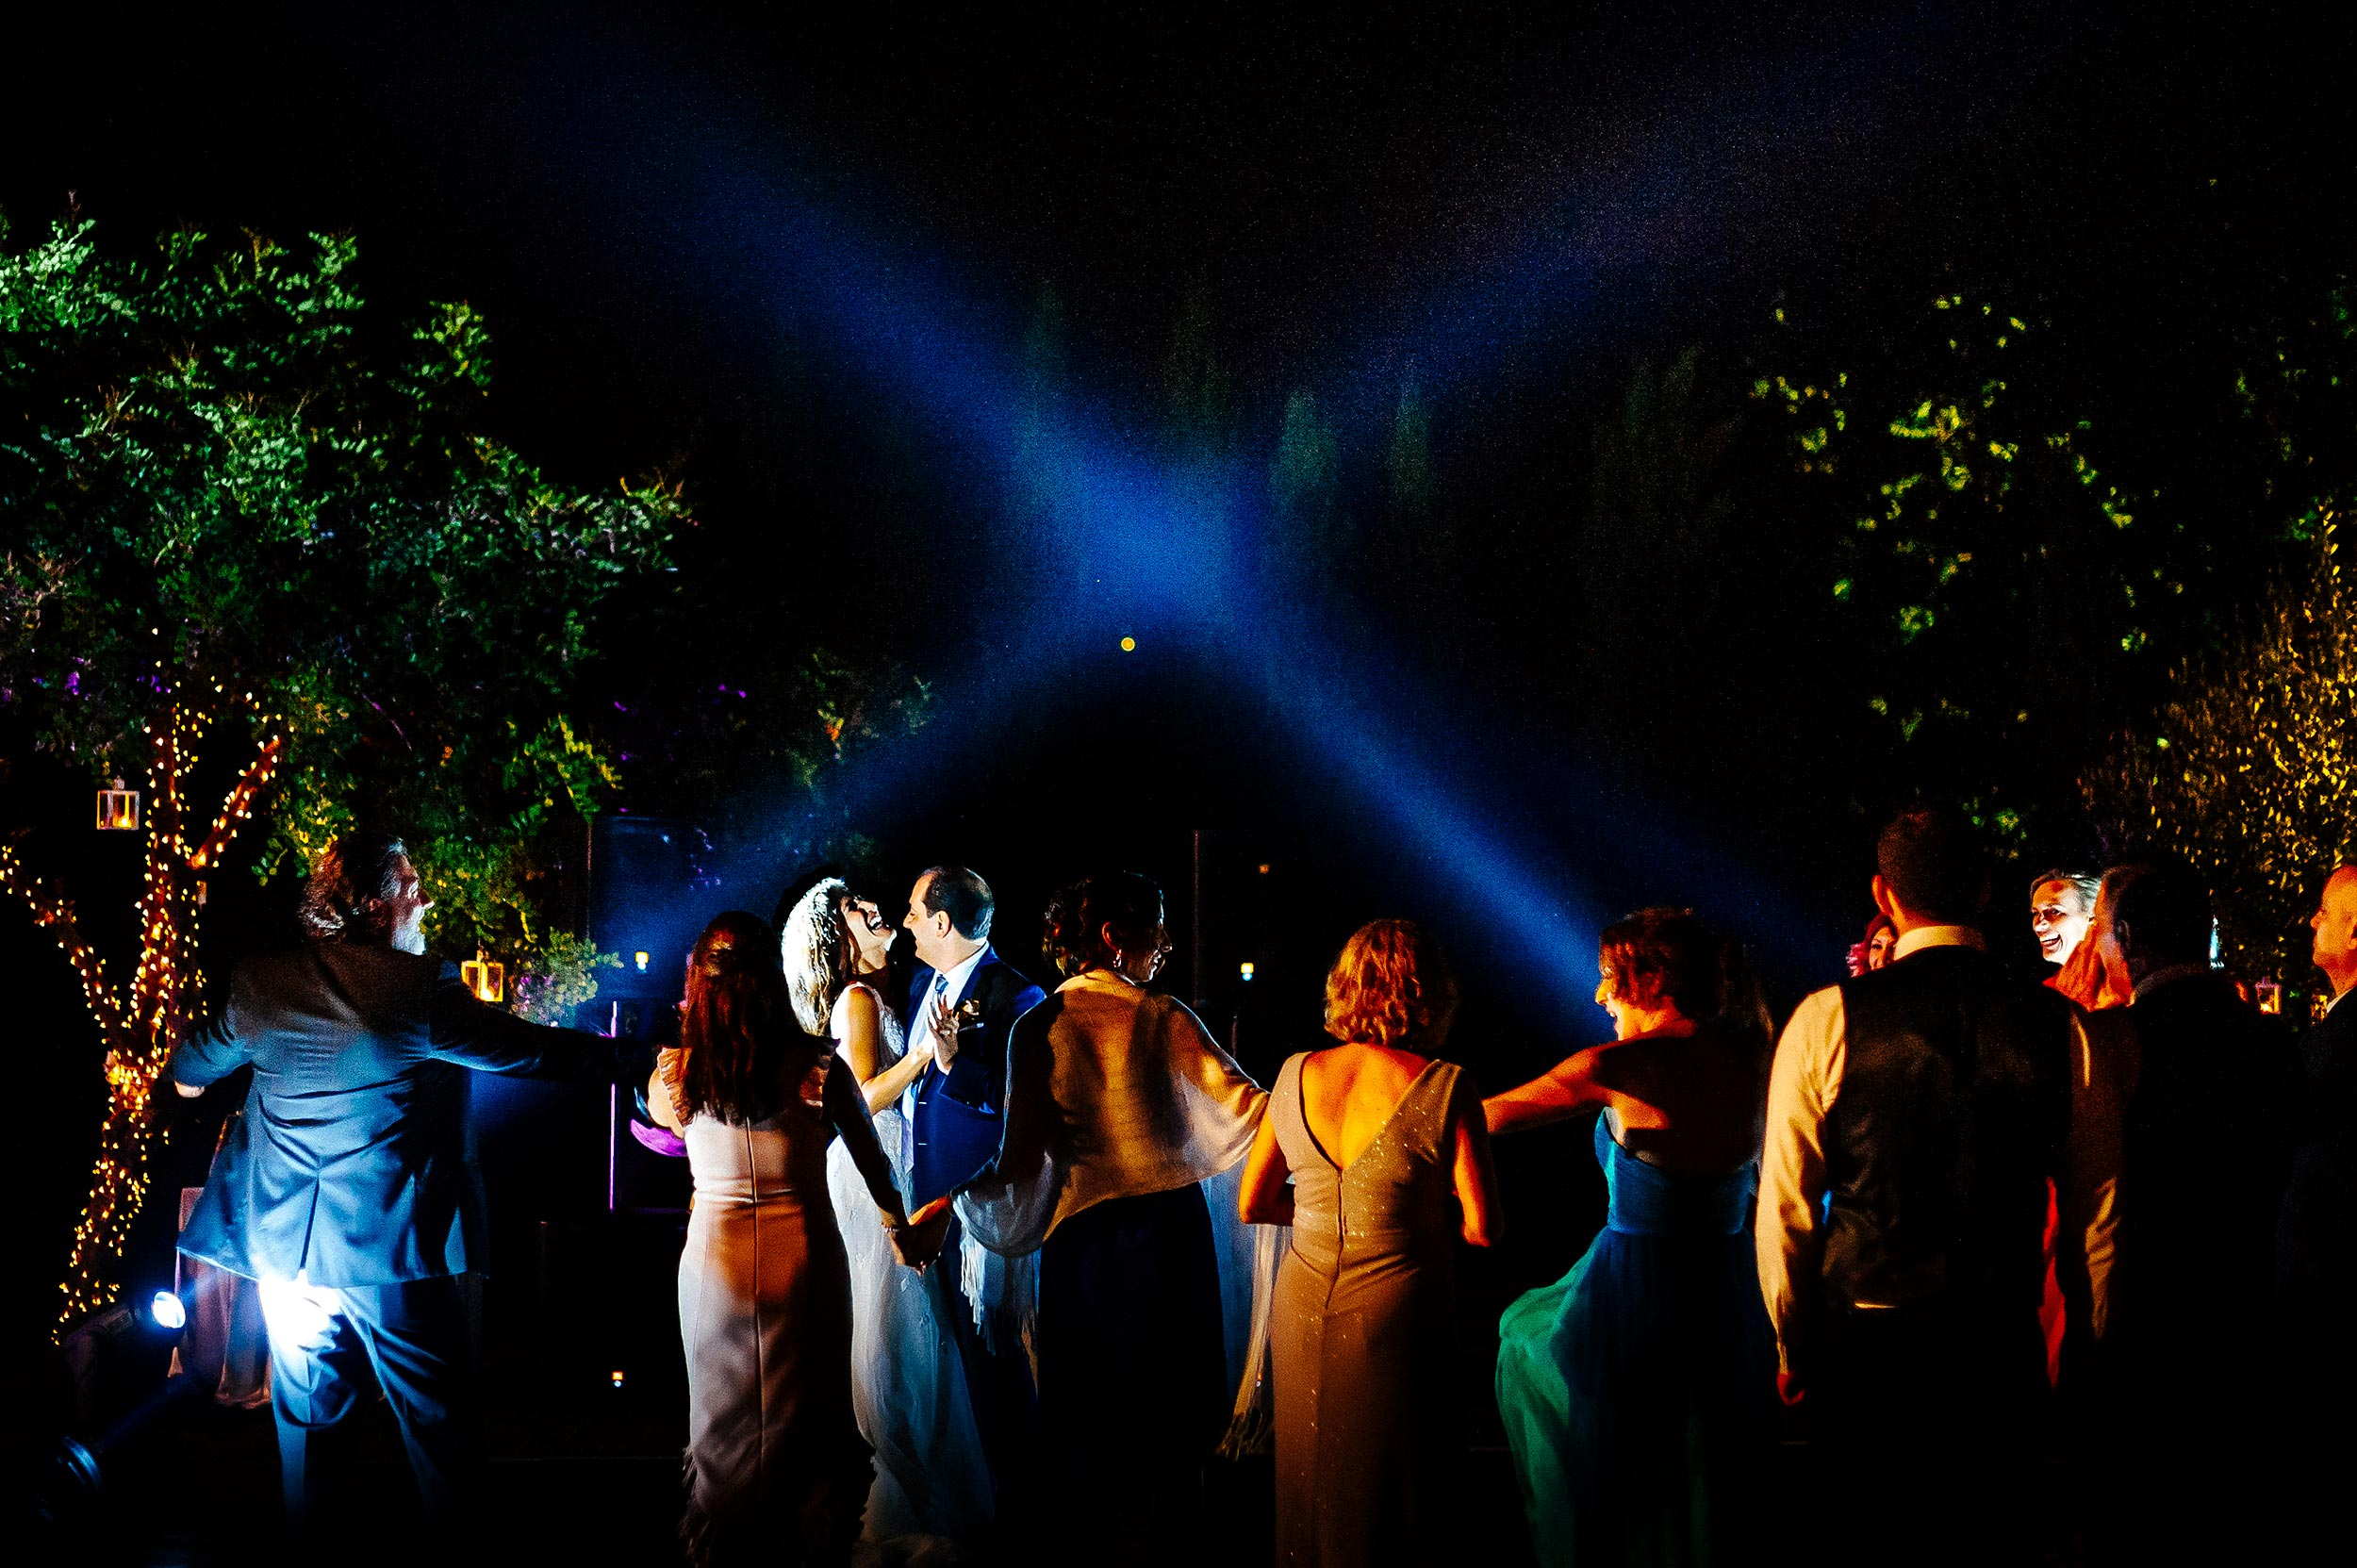 Dancefloor-Wedding-Ravello-Villa-Cimbrone-First-Dance-Bride-And-Groom-Alessandro-Avenali-Luxury-Photographer-Italy.jpg